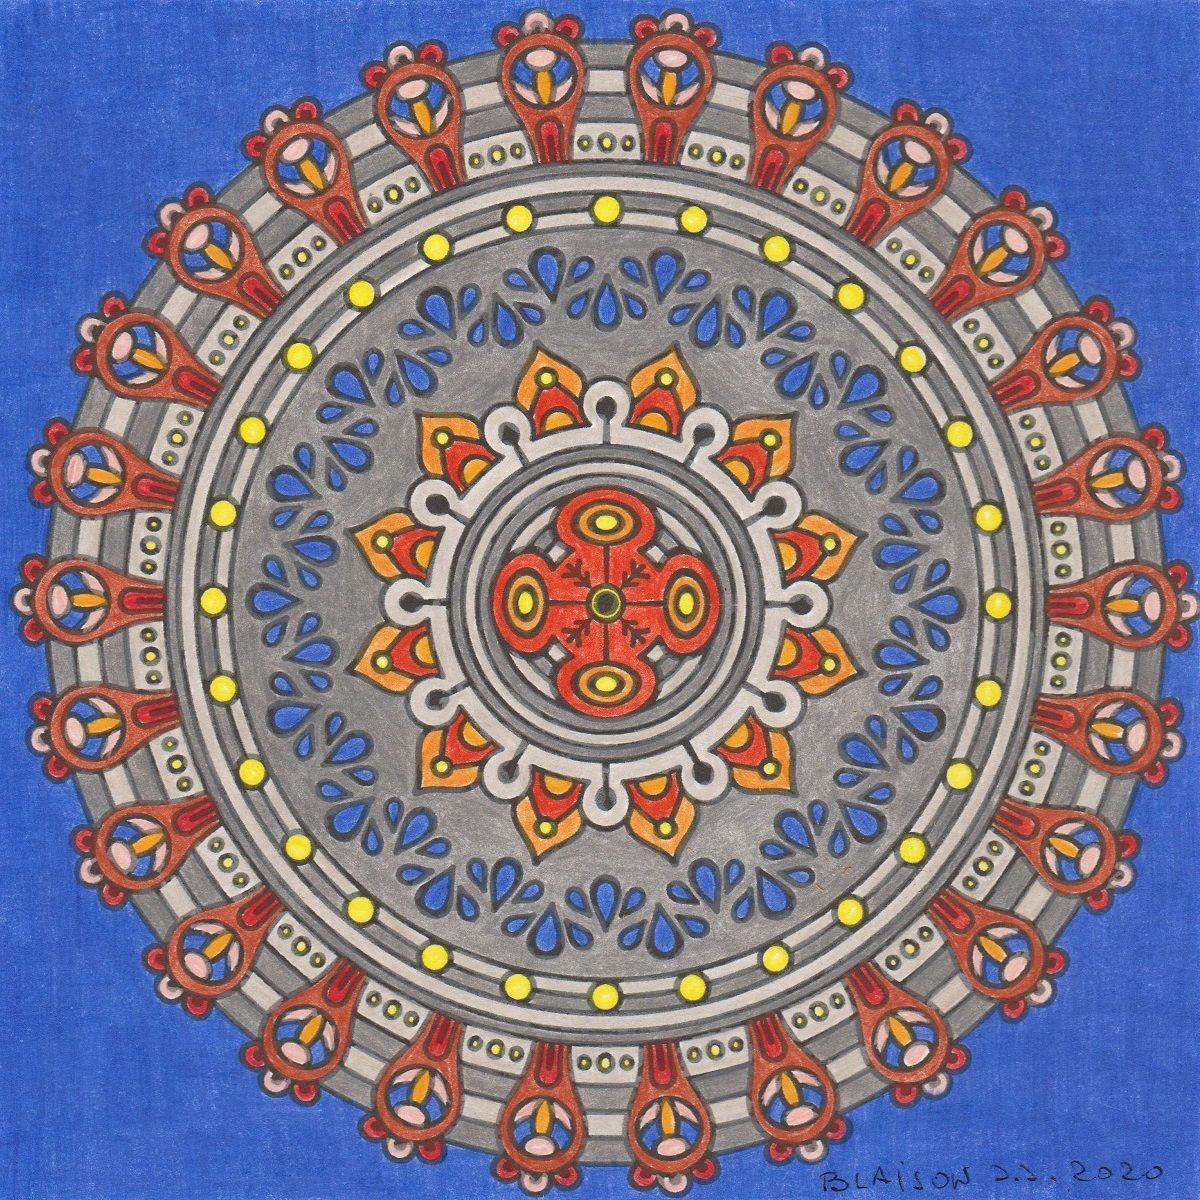 Malvorlagen 533 Quot Fastenzeit Quot Picture Design Mandala Faber Castell